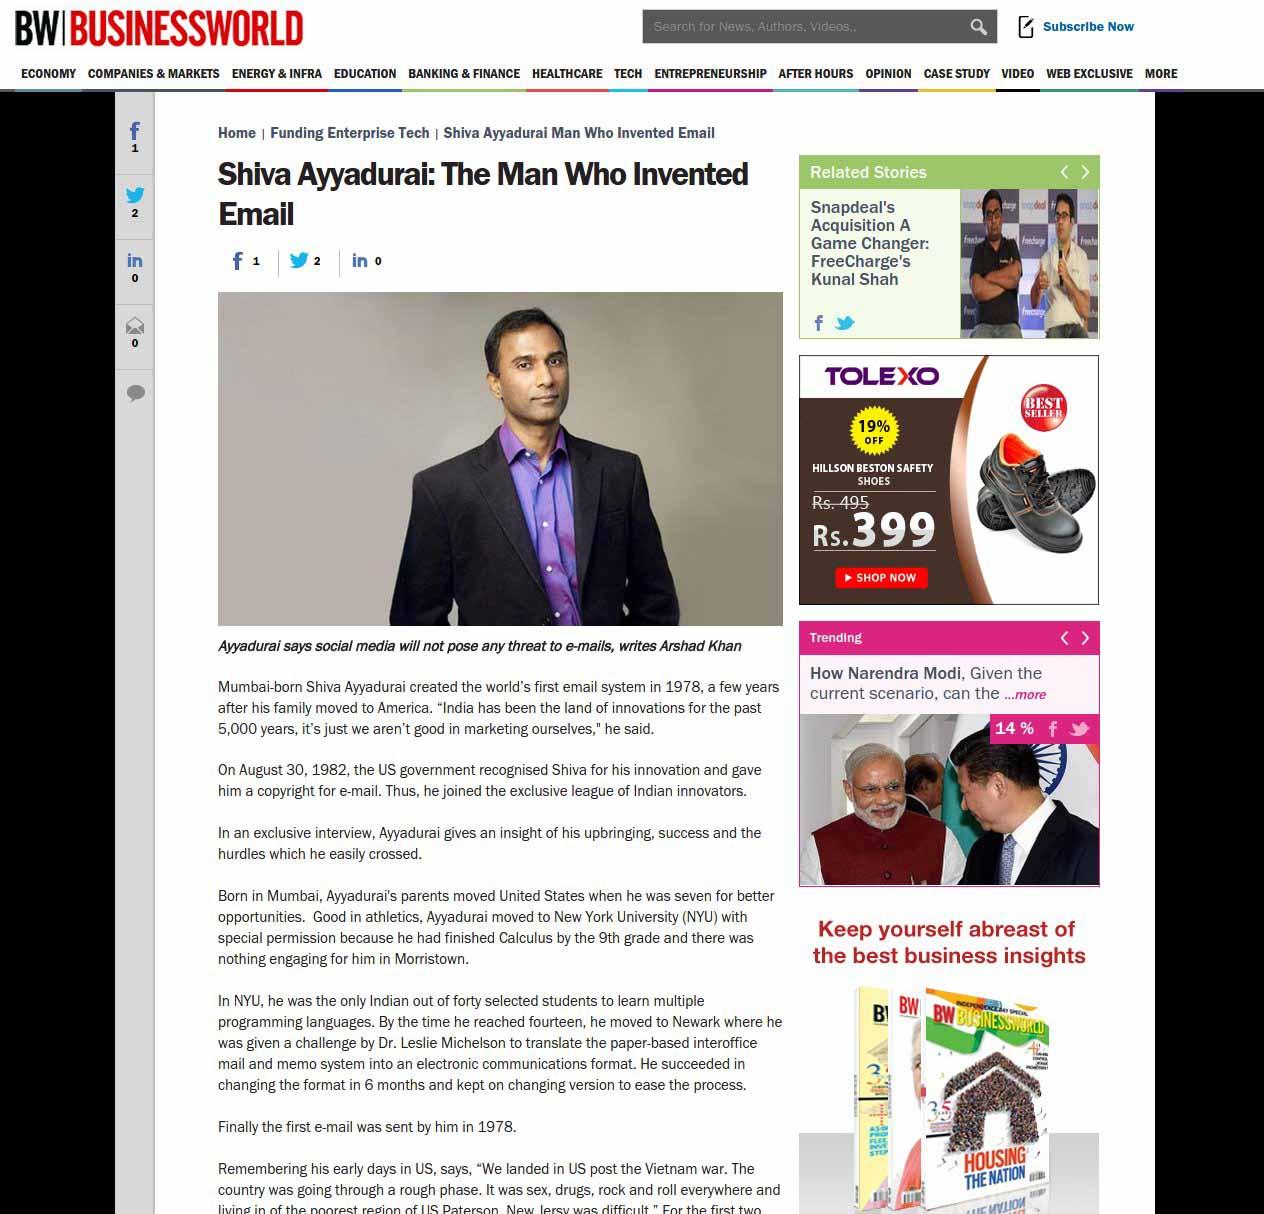 Shiva Ayyadurai: The Man Who Invented Email